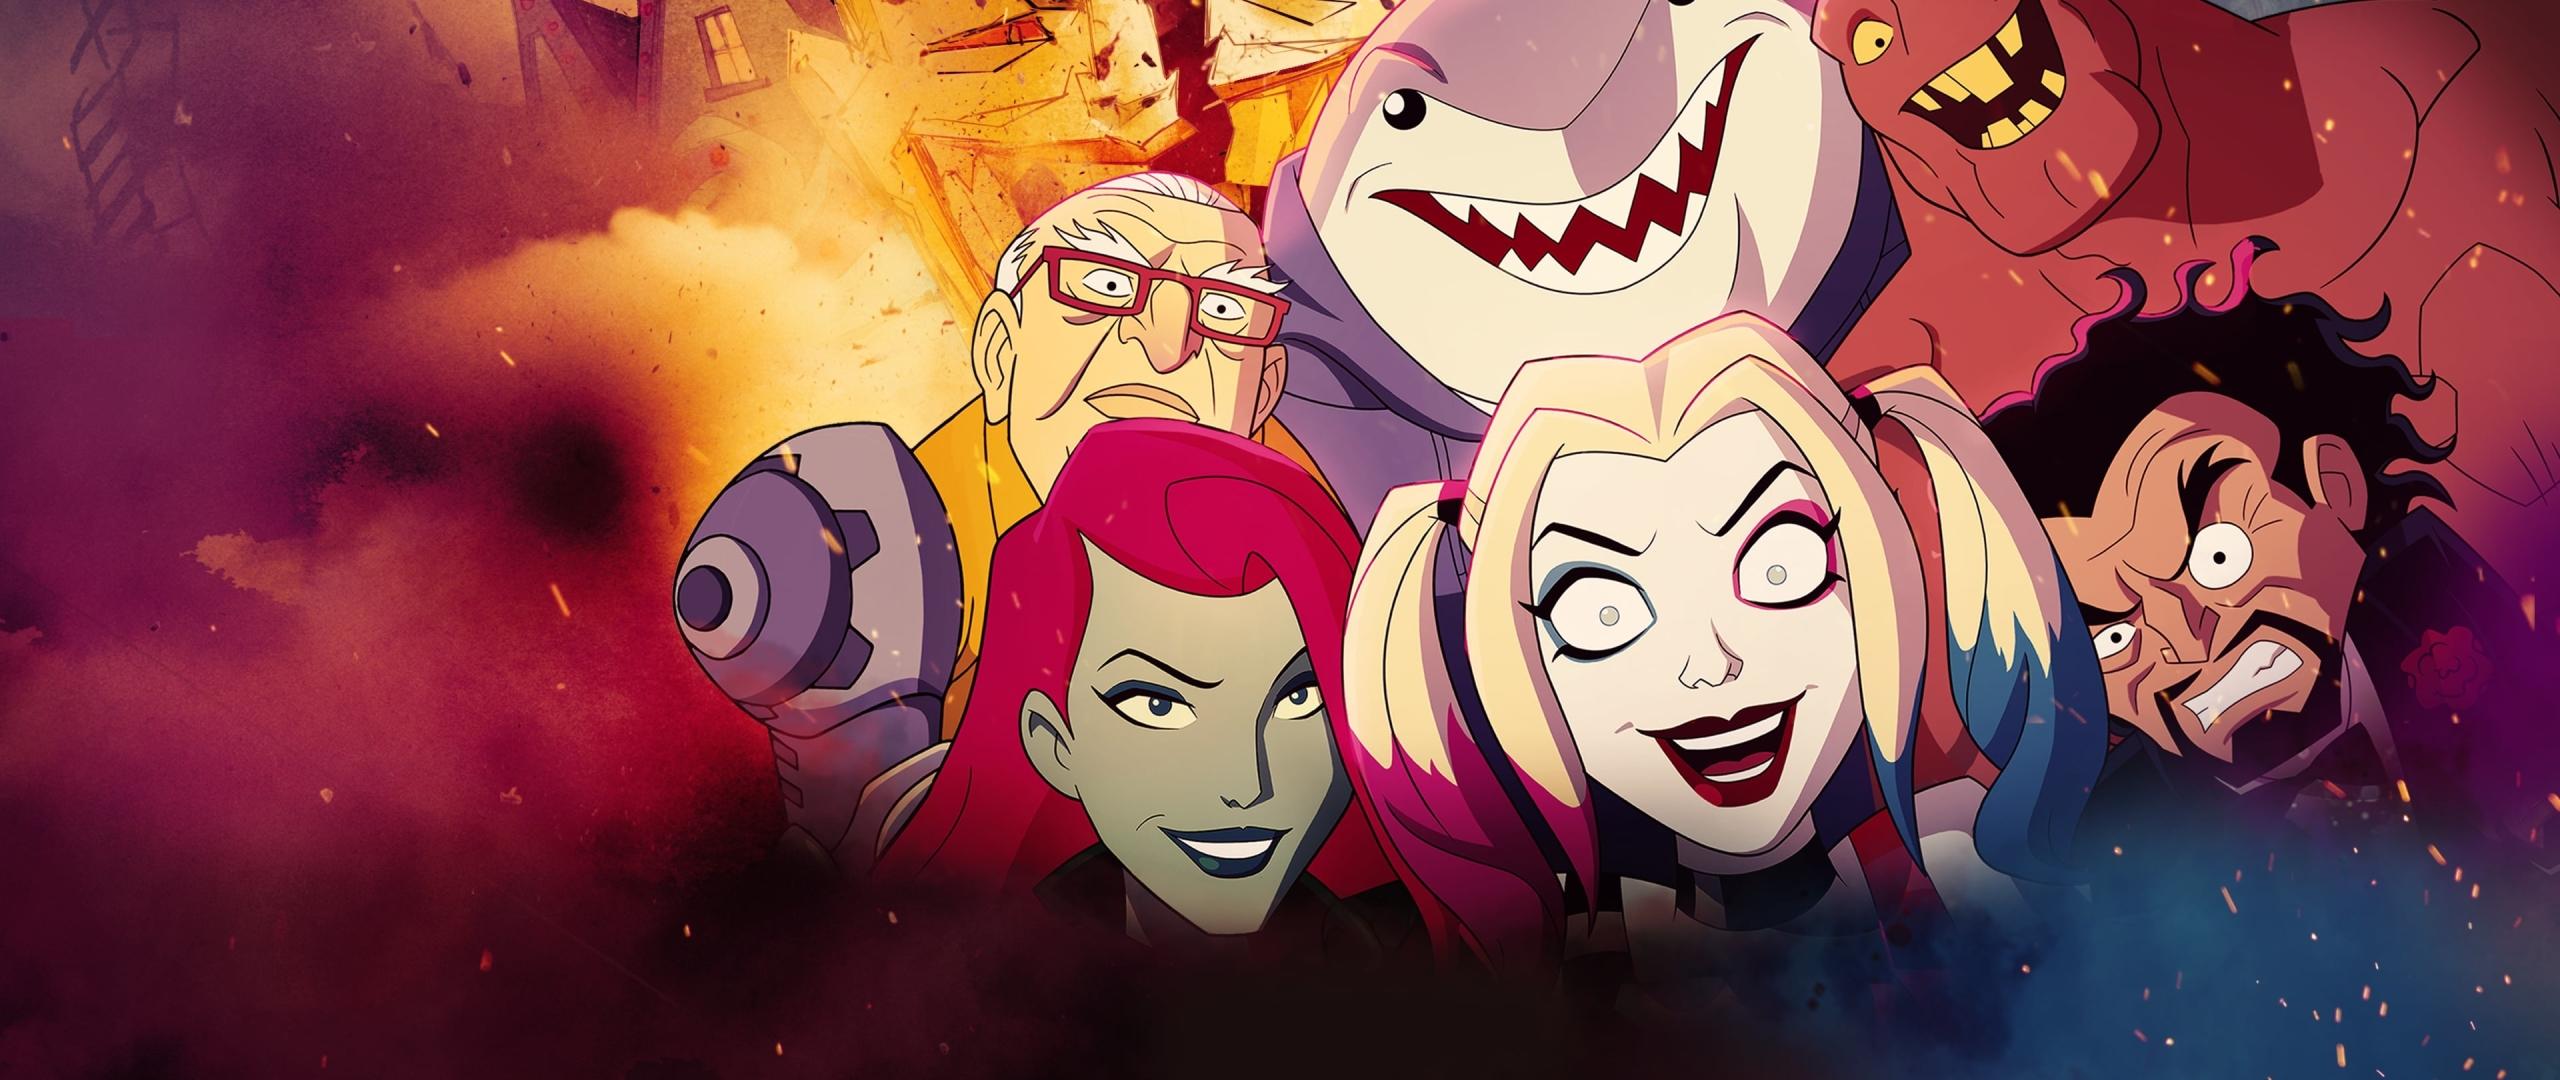 2560x1080 Harley Quinn Animated Series 2560x1080 ...